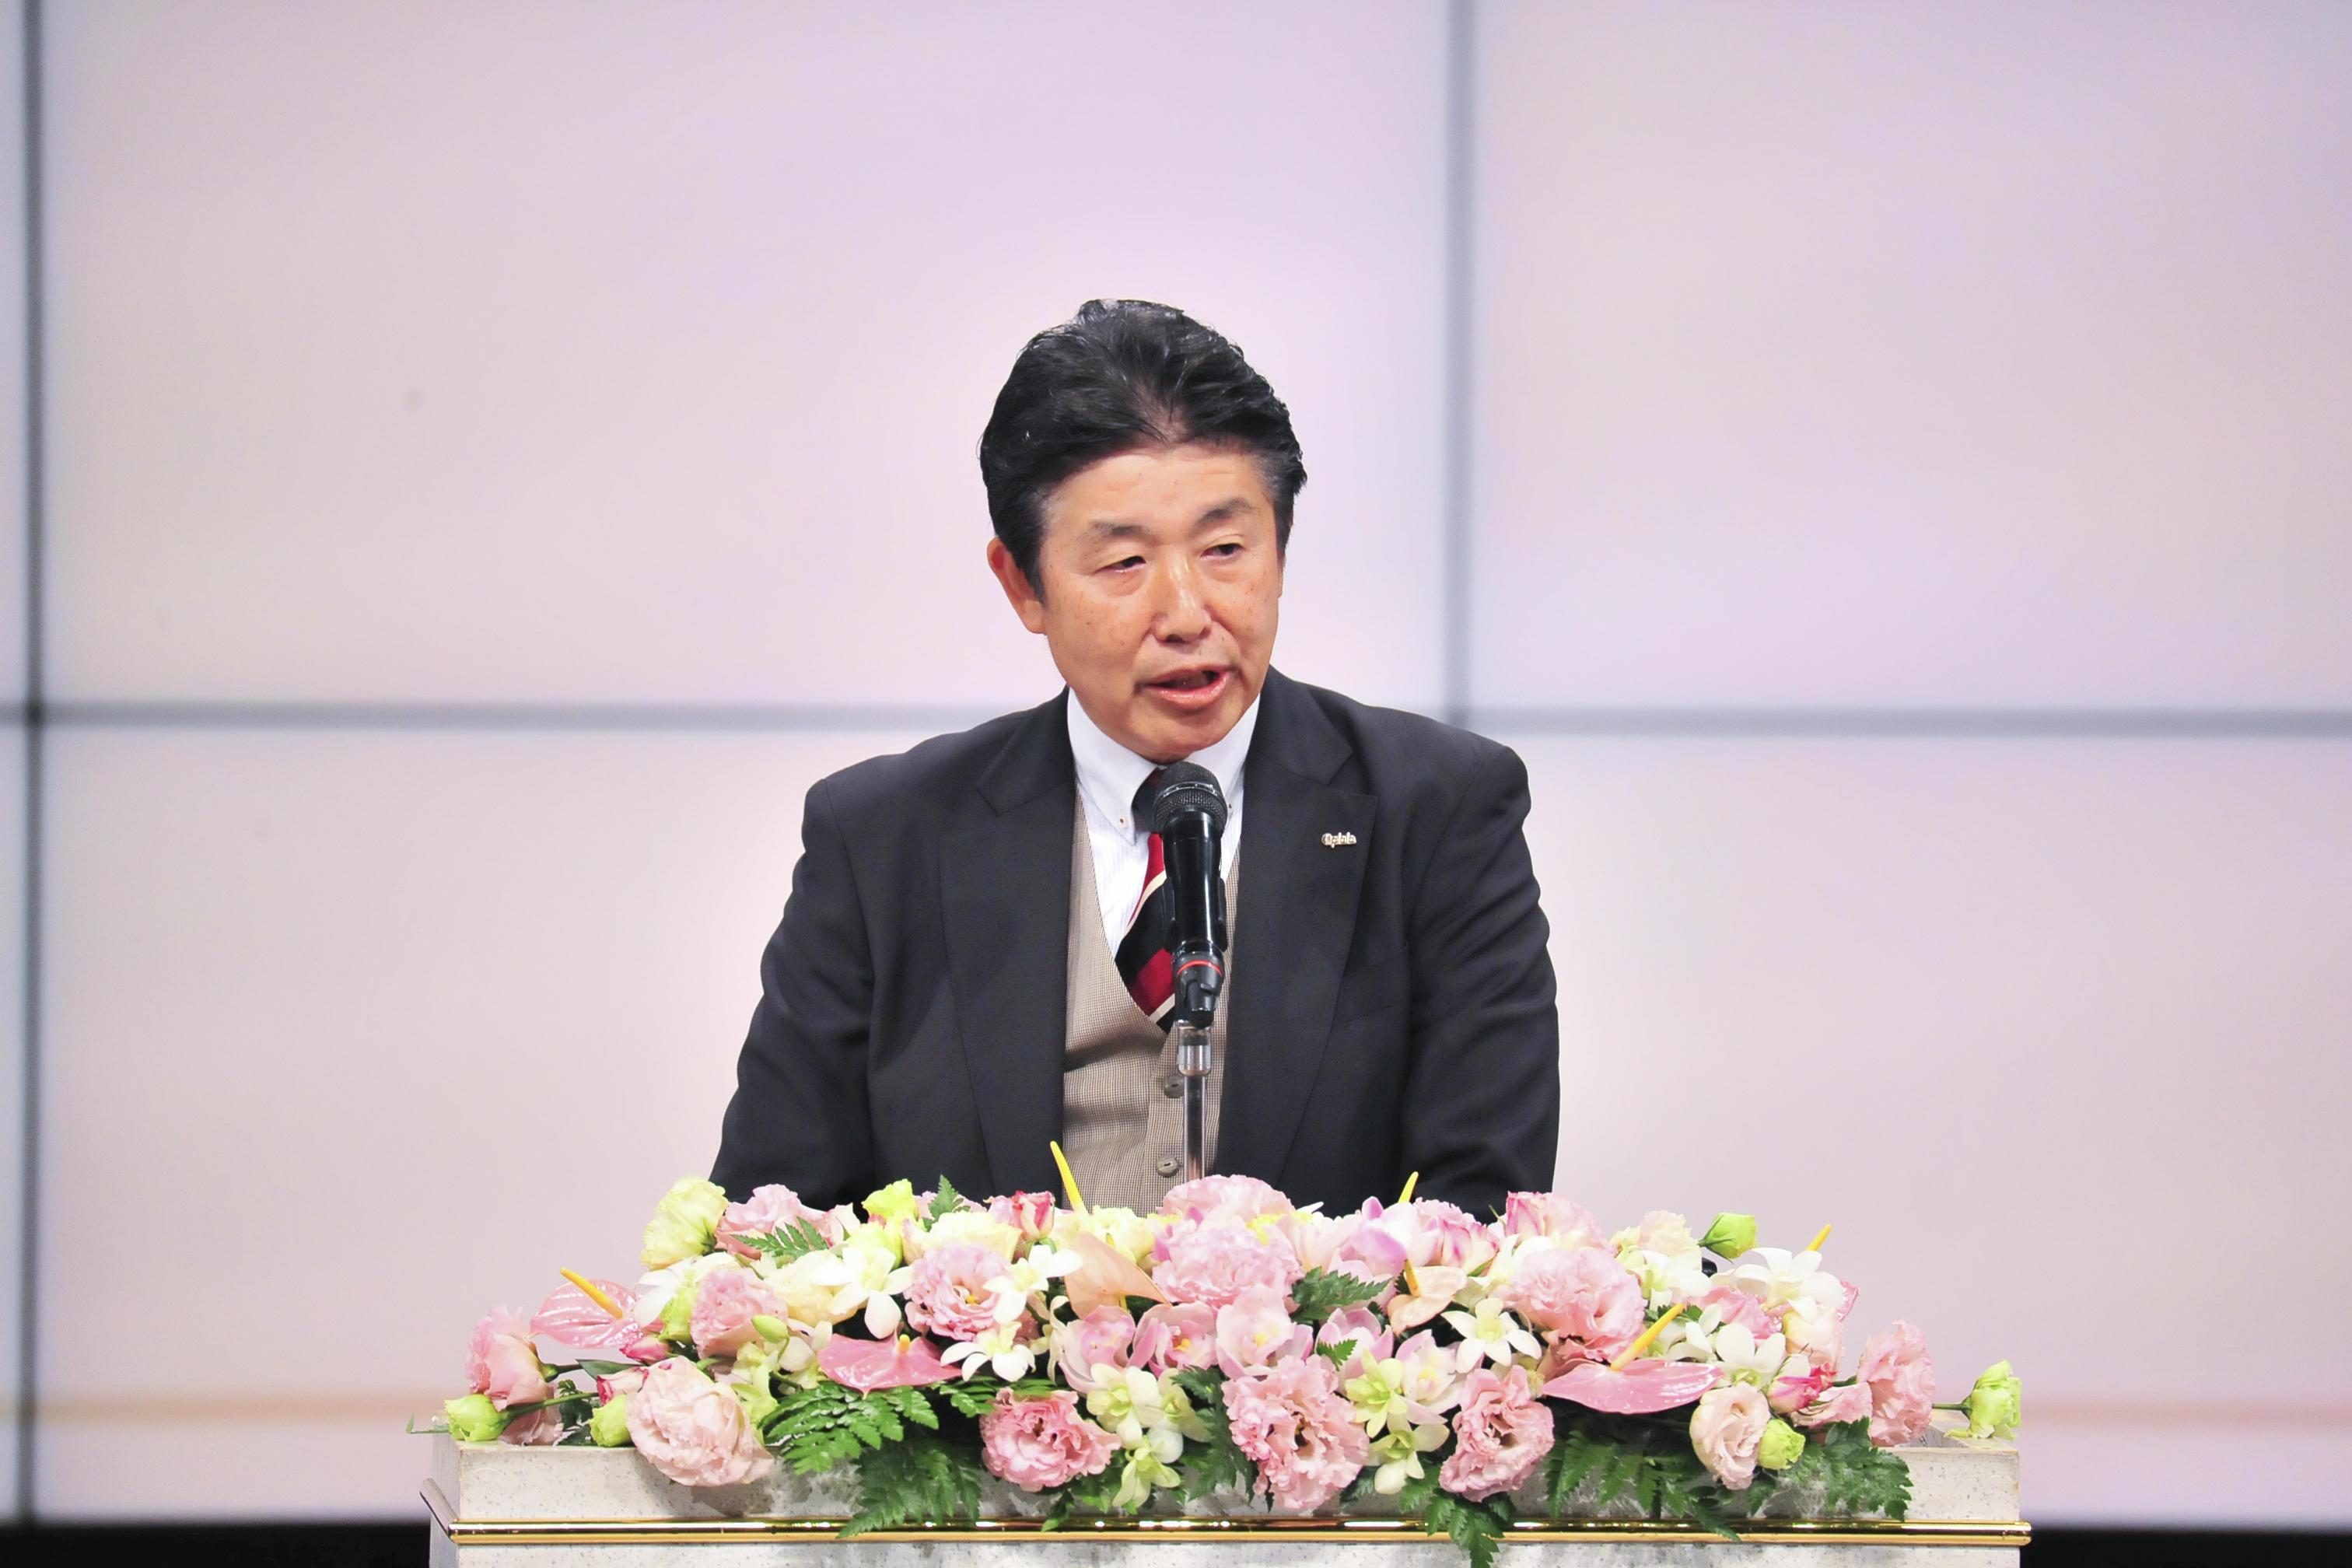 http://news.yoshimoto.co.jp/20170425155631-5b0a85c2fdf619d16477069fcd76bb66f4c498df.jpg